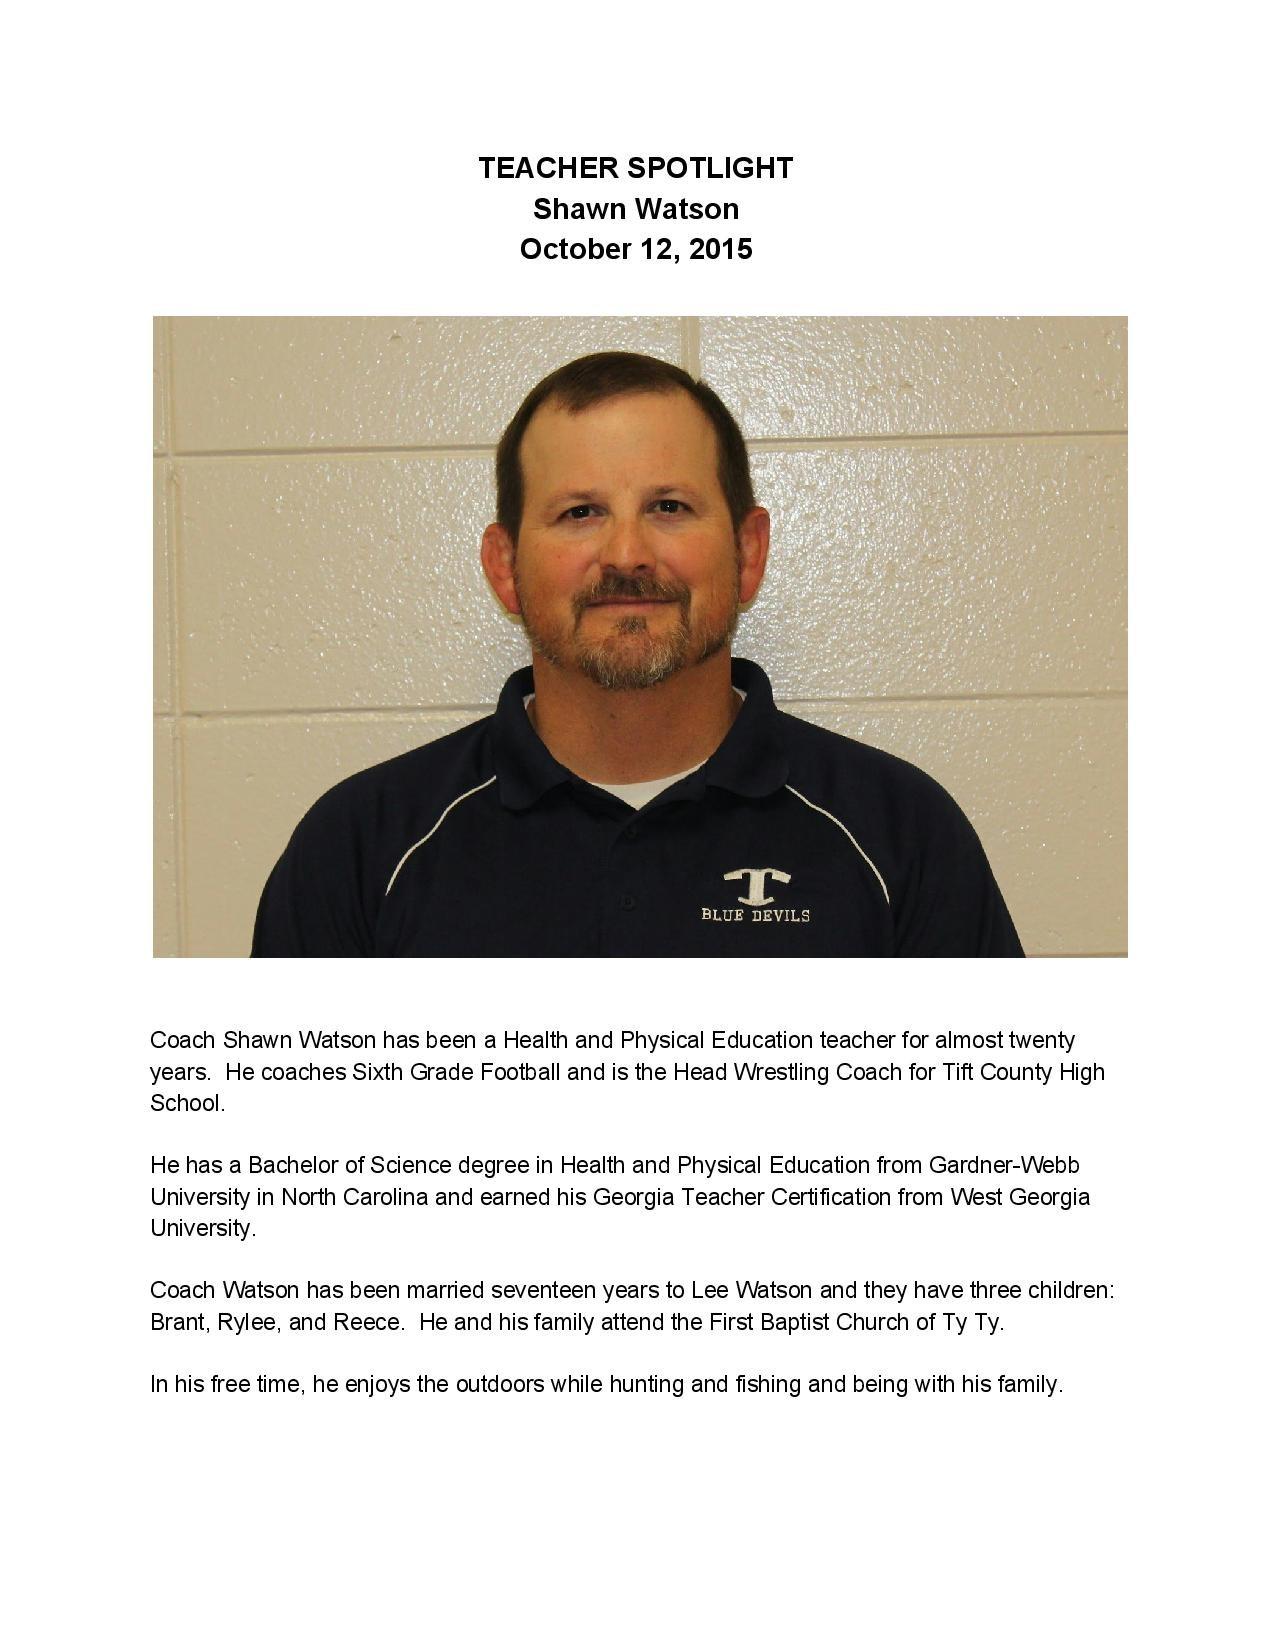 Northeast campus tift county high school this weeks teacher spotlight is on coach shawn watson xflitez Gallery